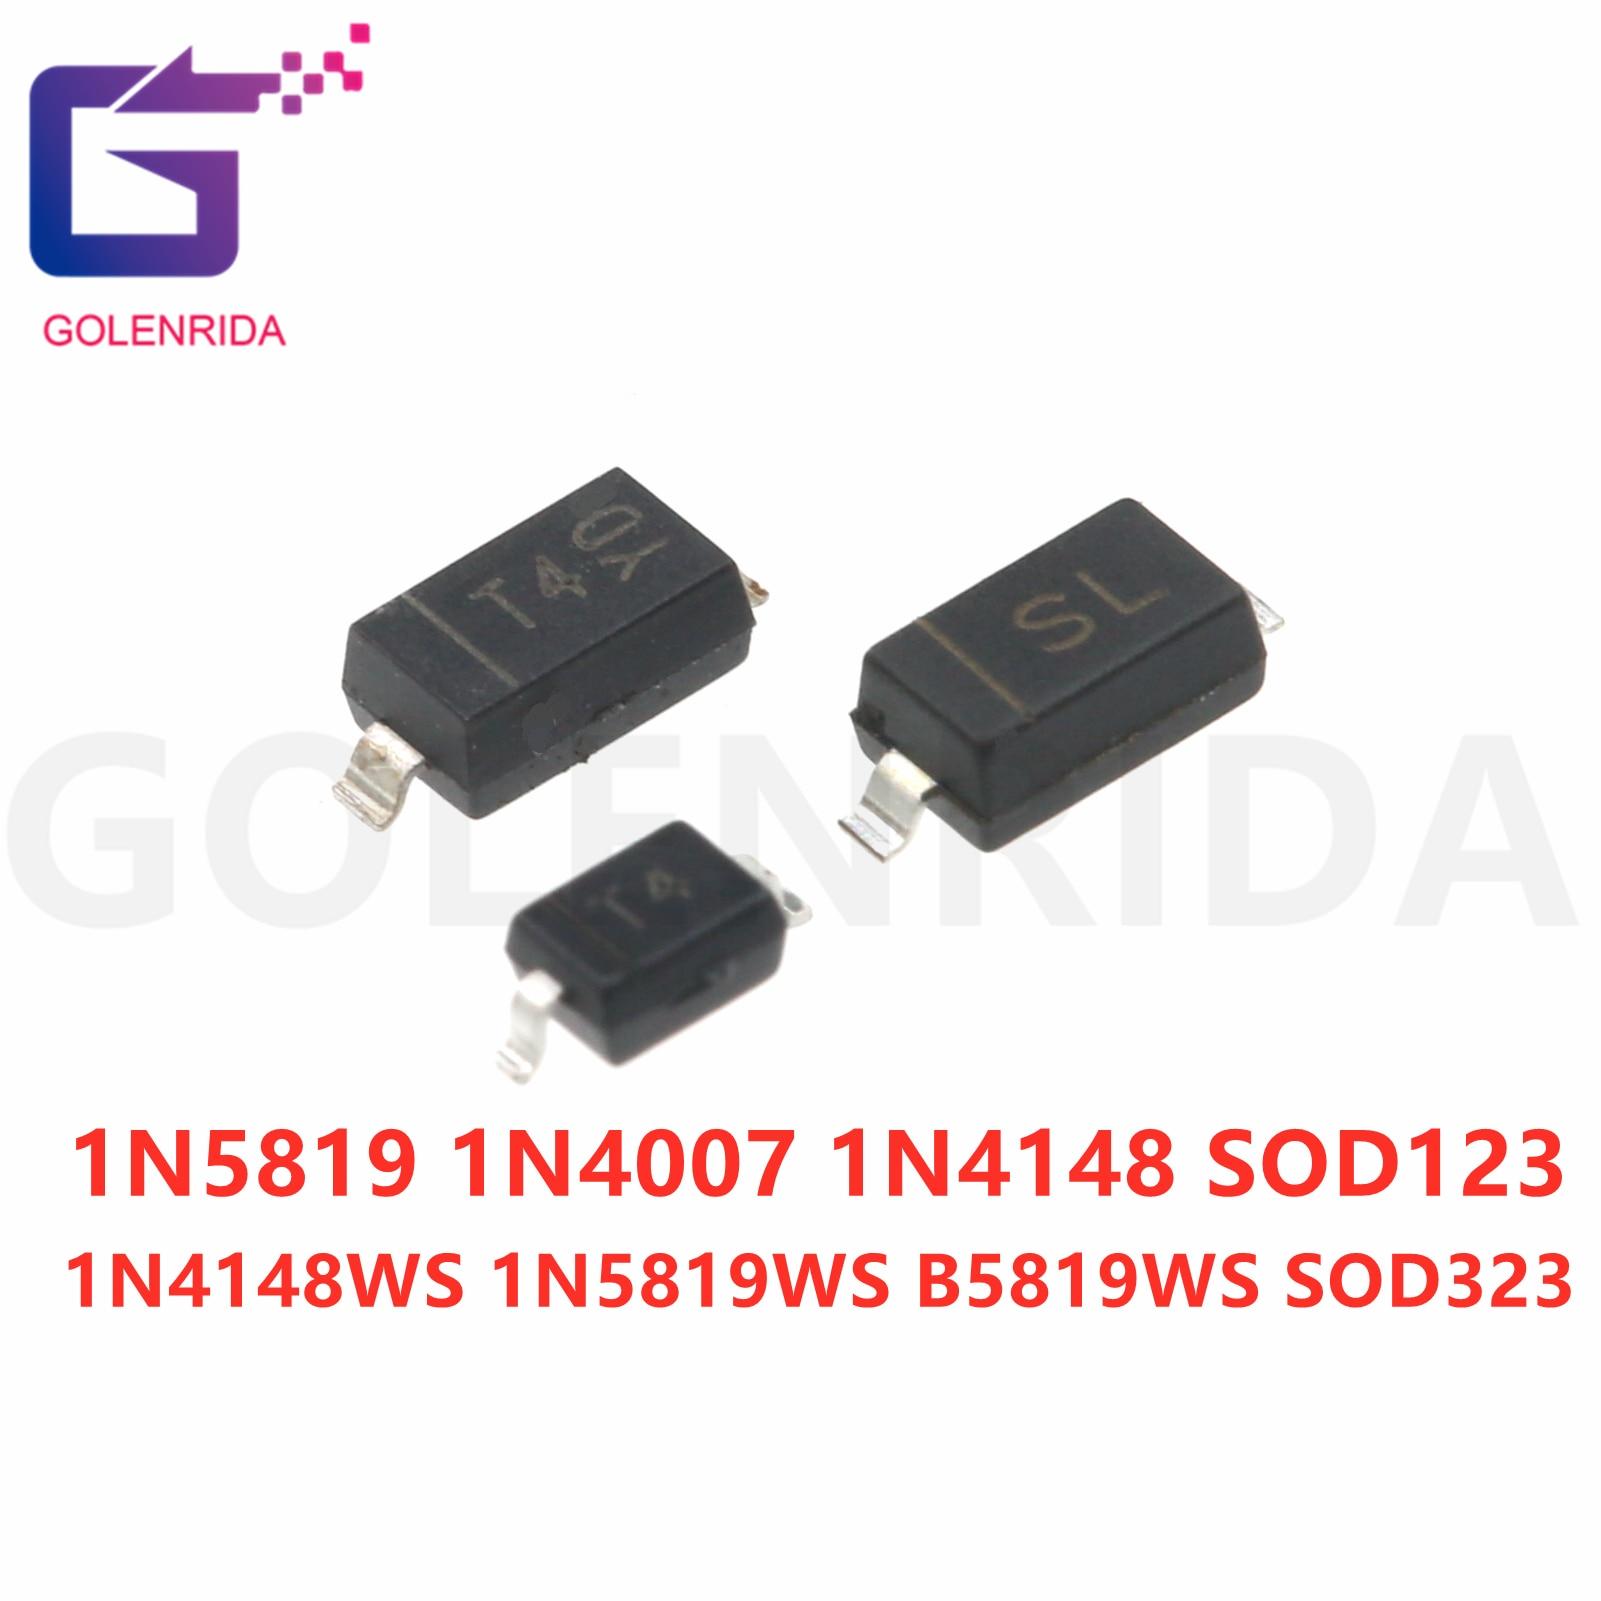 100 шт. SMD diode 0805 SOD-123 1N5819 1N4007 1N4148 SOD123 SOD-323 1206 1N4148WS 1N5819WS B5819WS SOD323